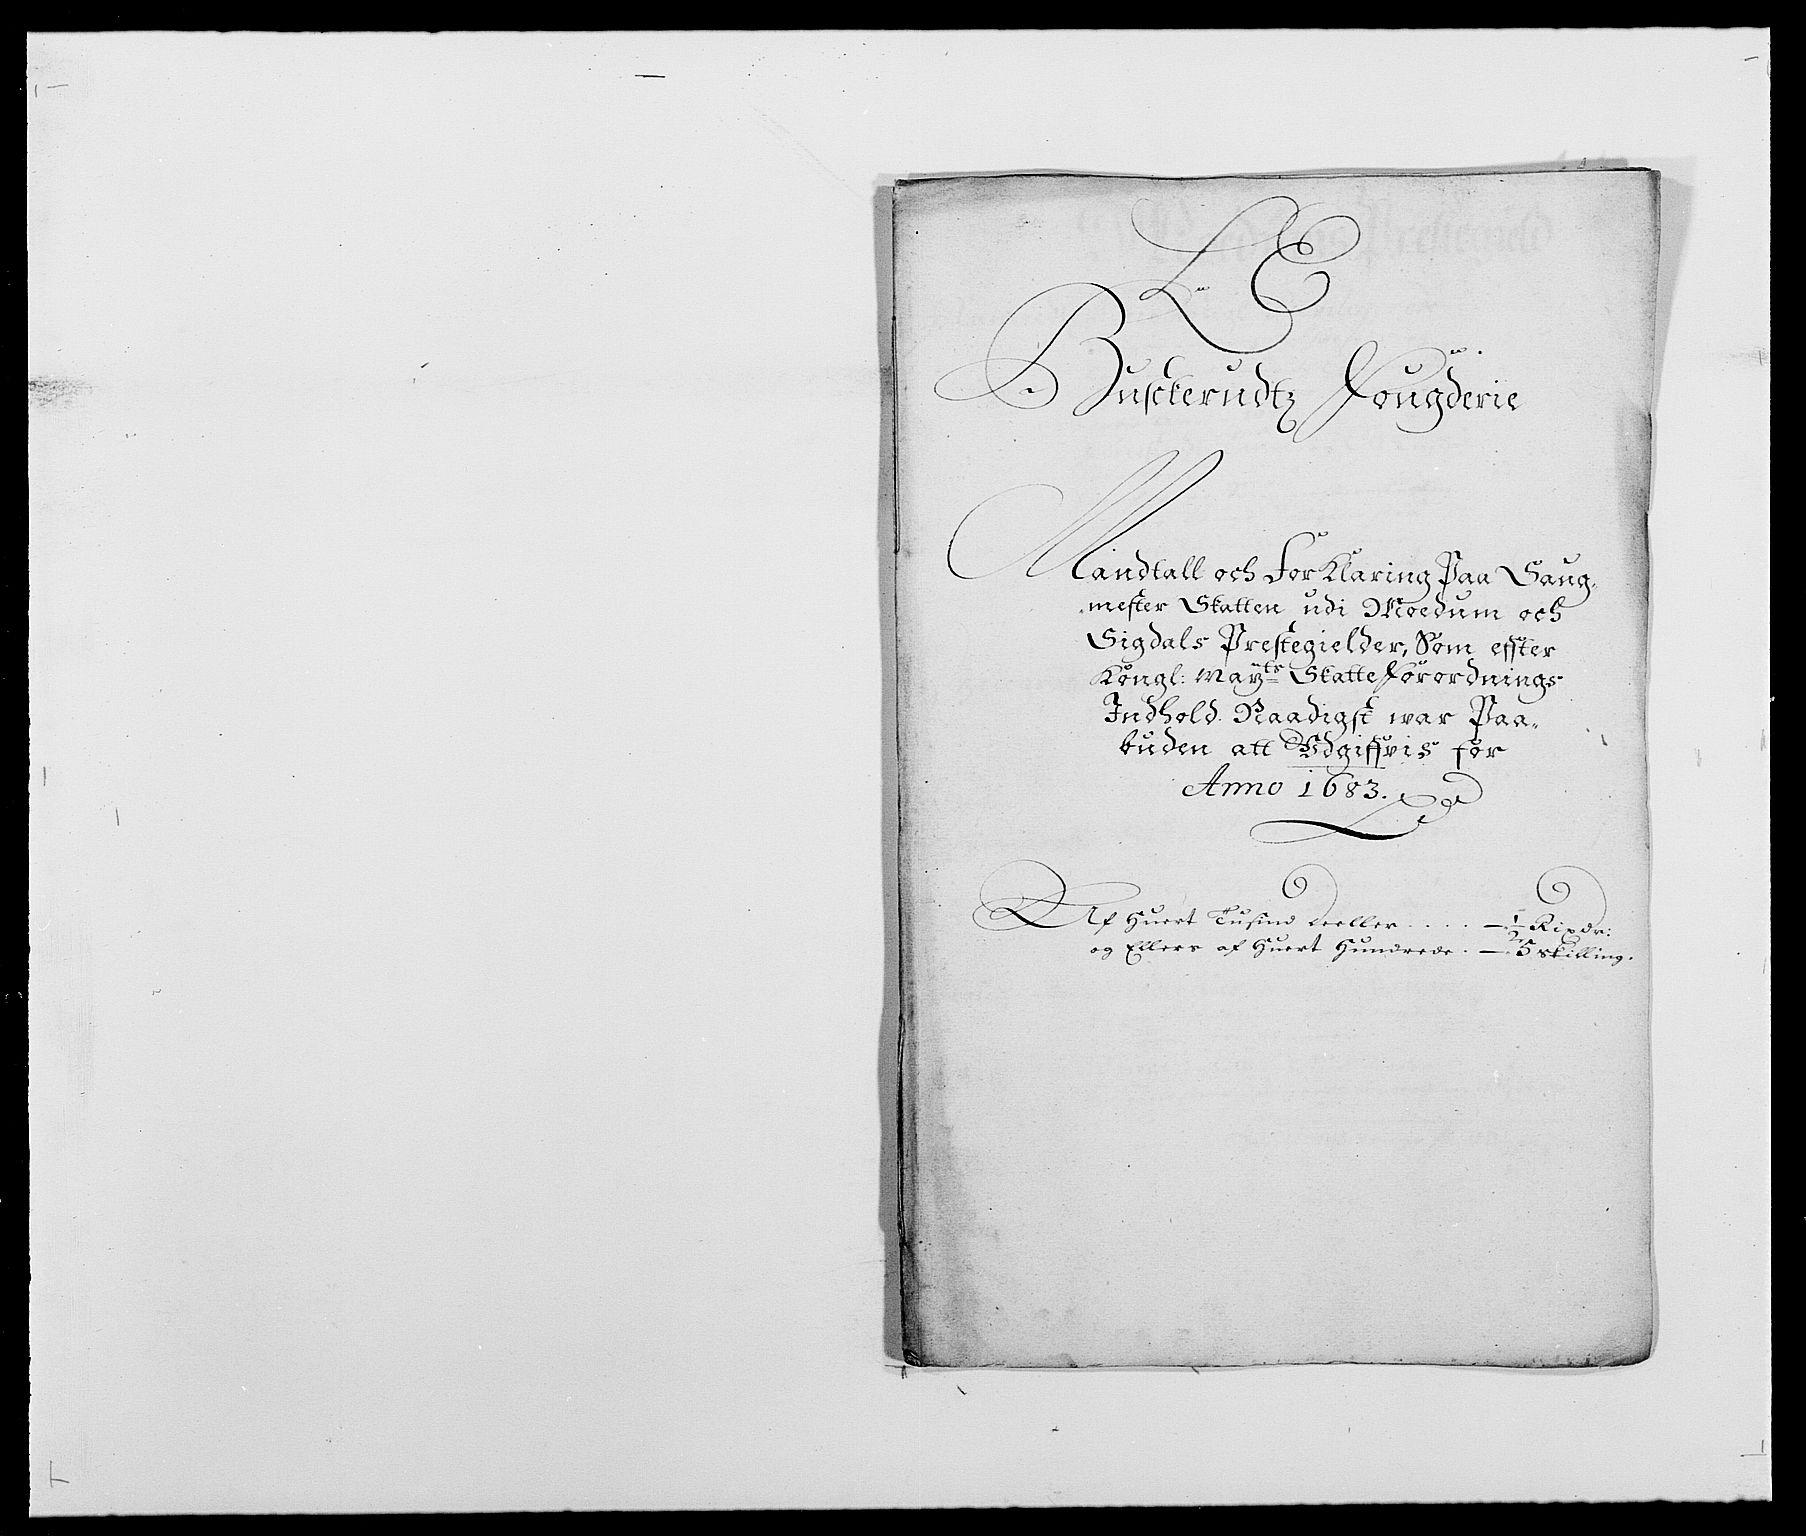 RA, Rentekammeret inntil 1814, Reviderte regnskaper, Fogderegnskap, R25/L1677: Fogderegnskap Buskerud, 1683-1684, s. 116